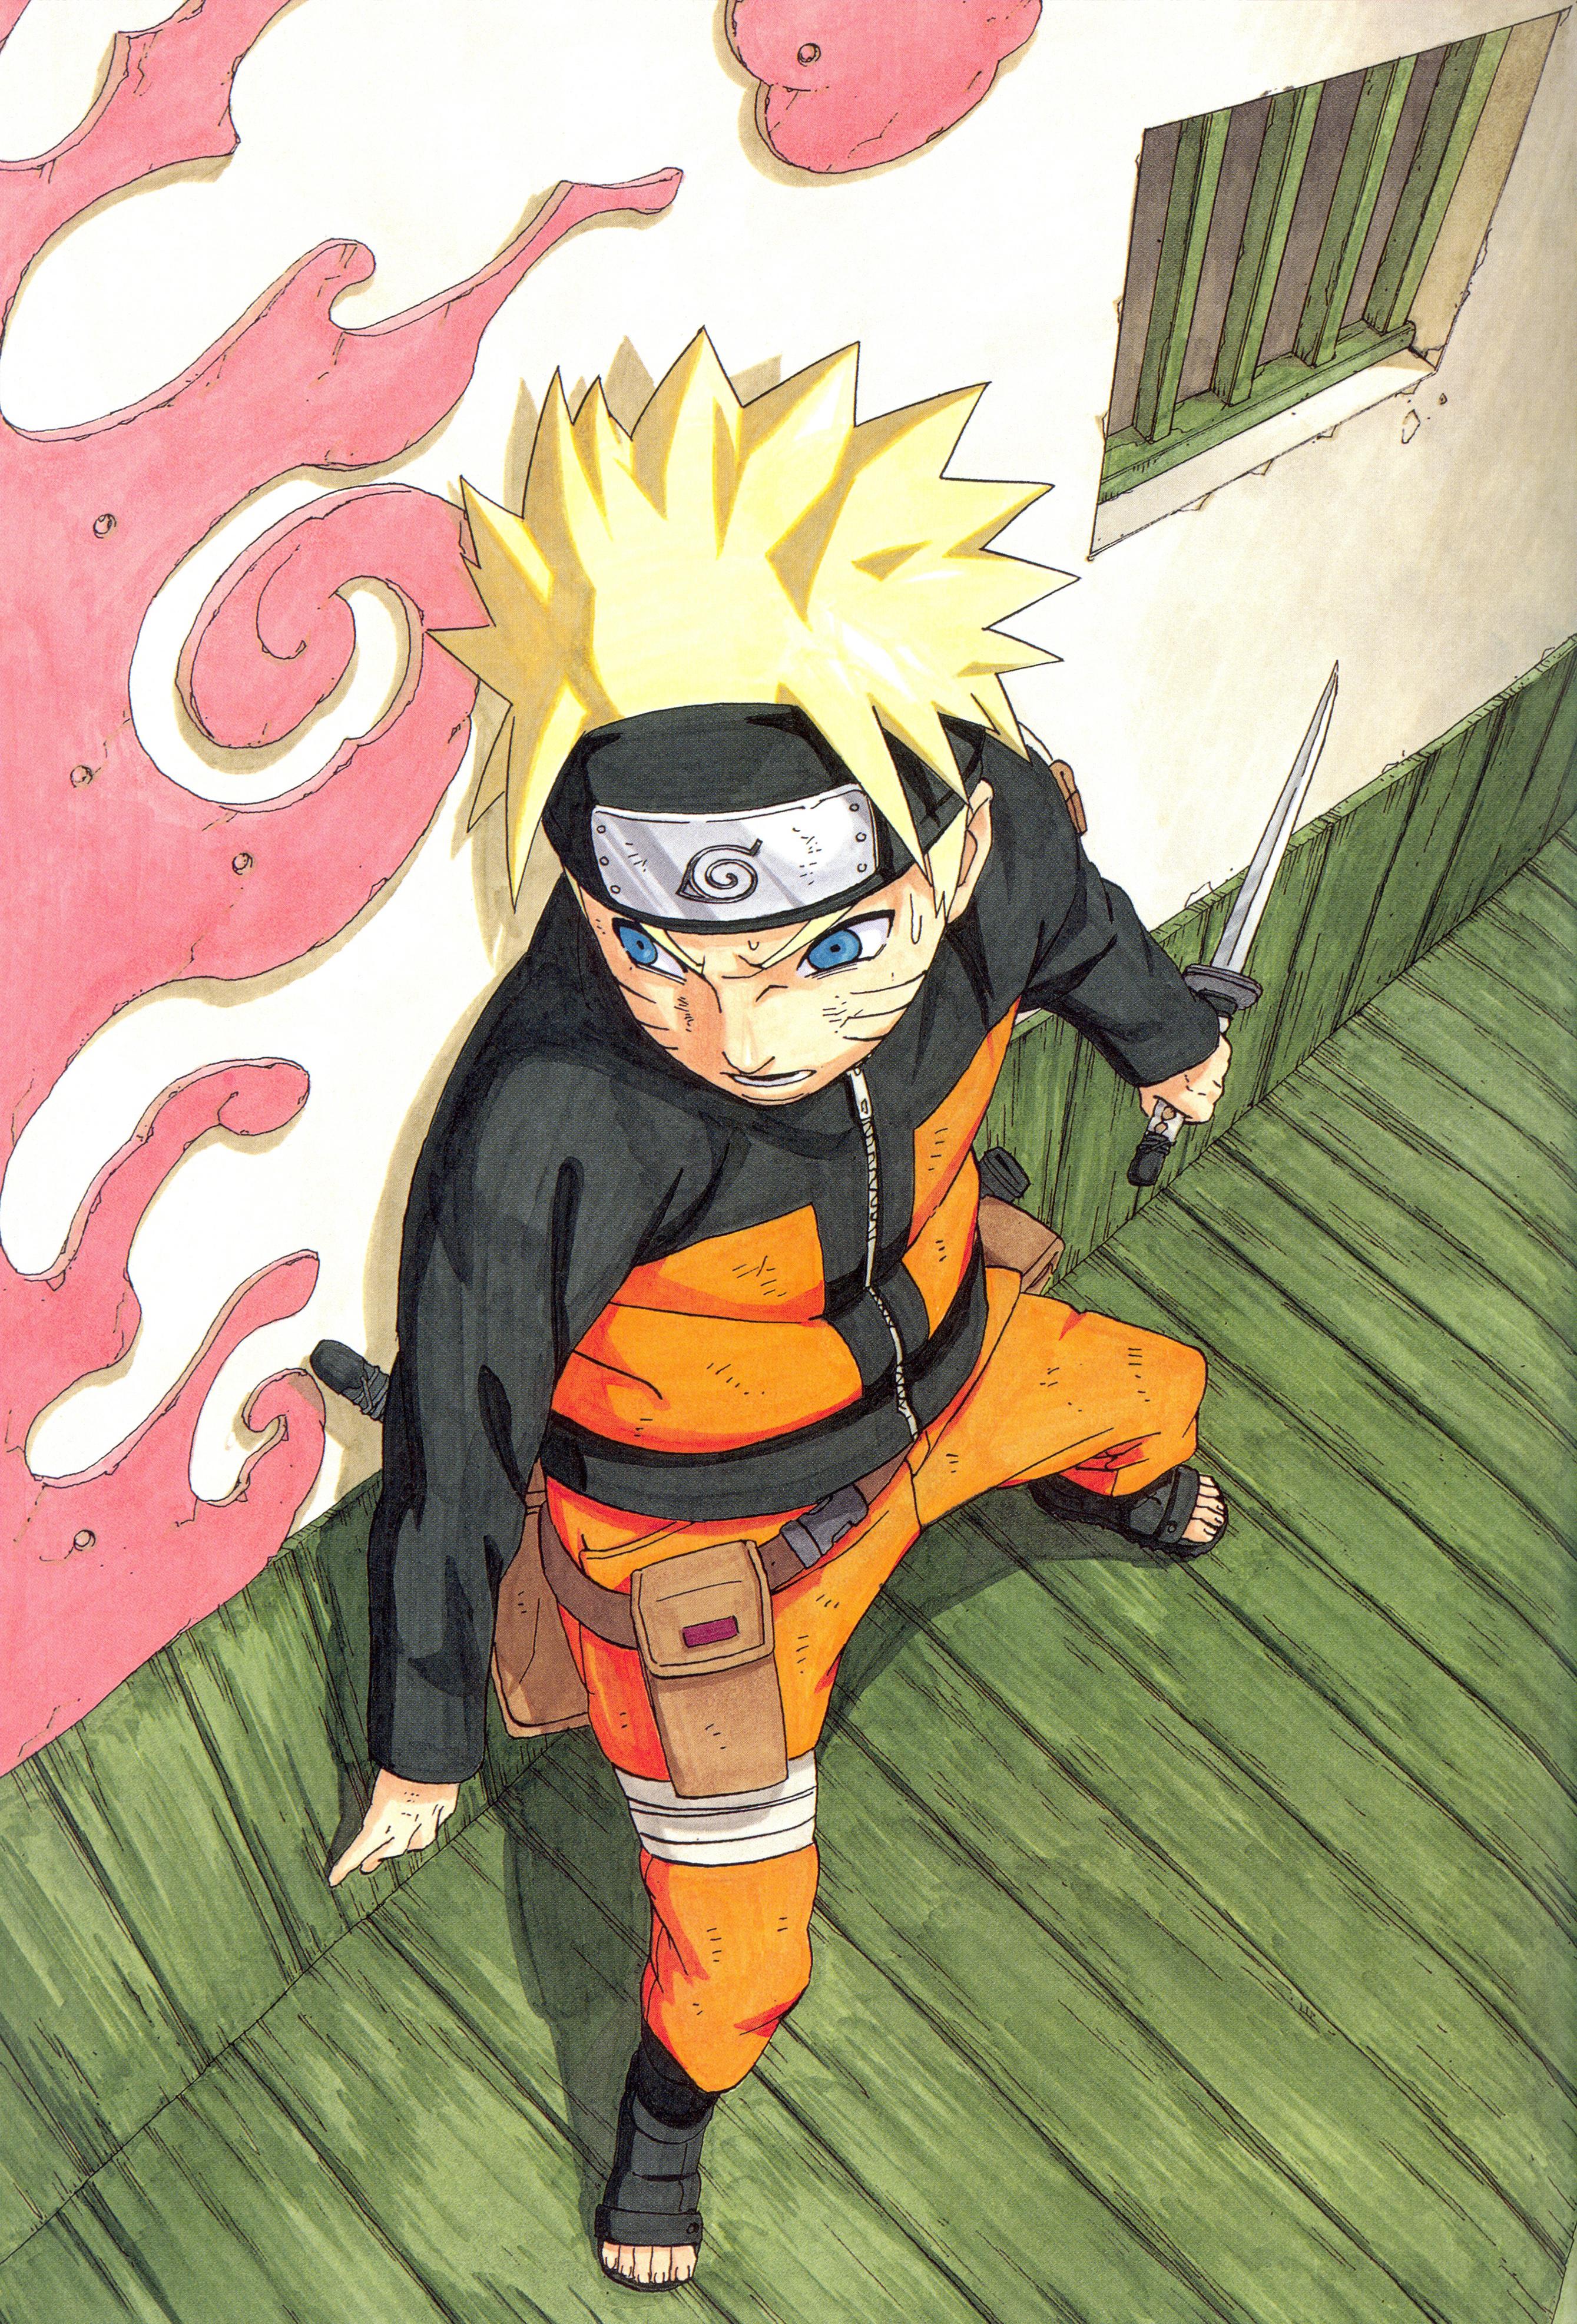 Uzumaki Naruto Mobile Wallpaper #186218 - Zerochan Anime